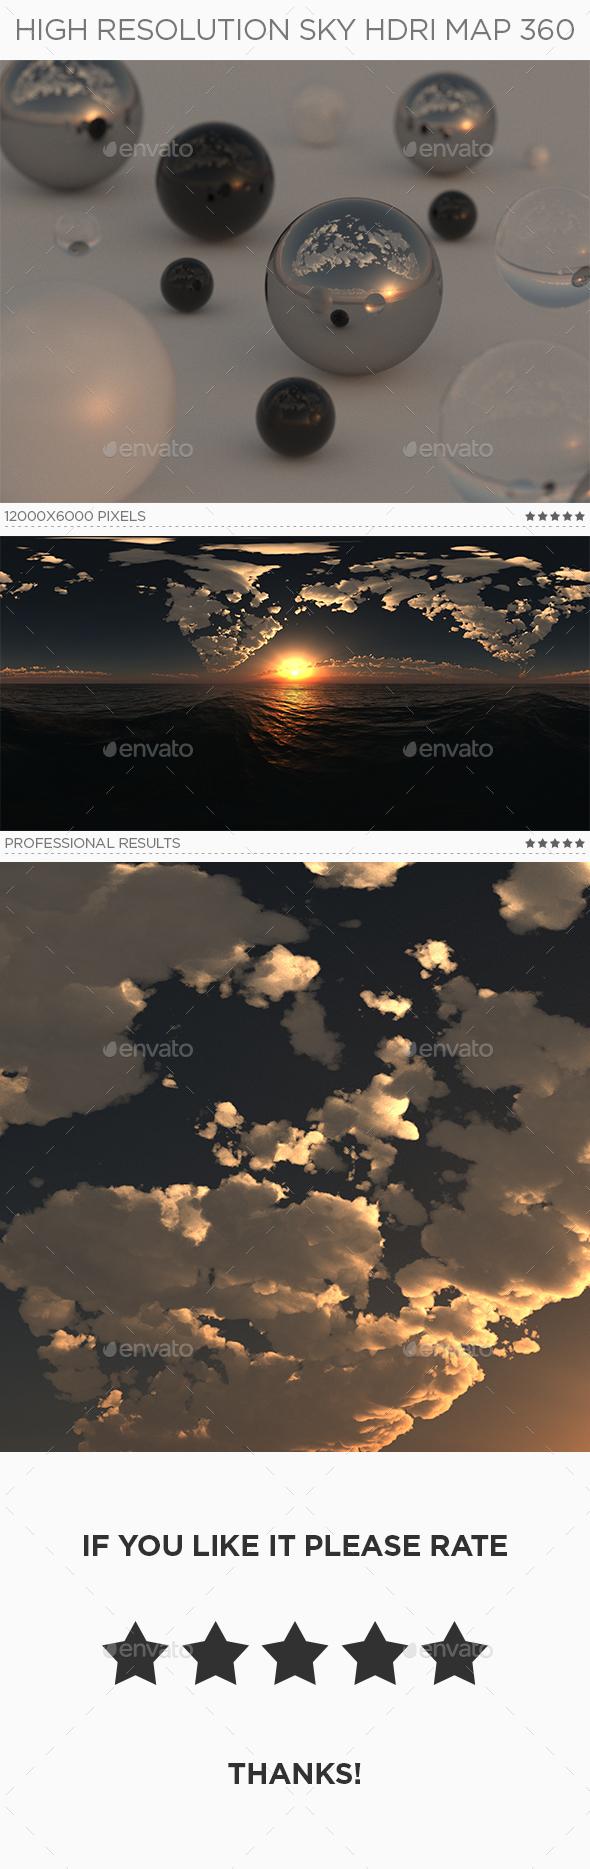 High Resolution Sky HDRi Map 360 - 3DOcean Item for Sale